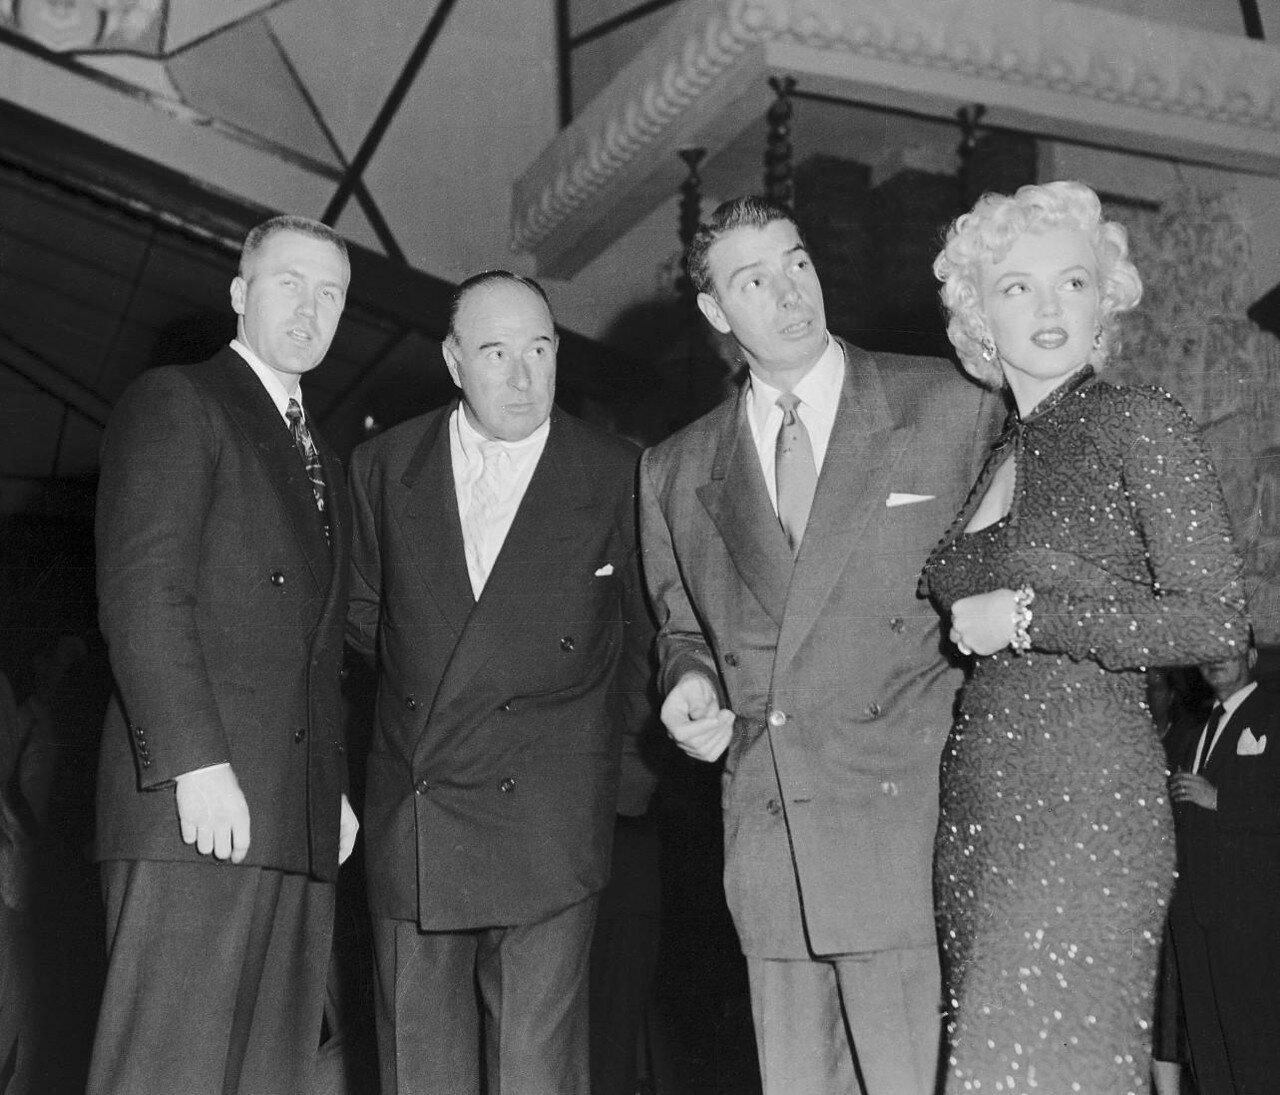 Marilyn Monroe and Joe DiMaggio in Tokyo